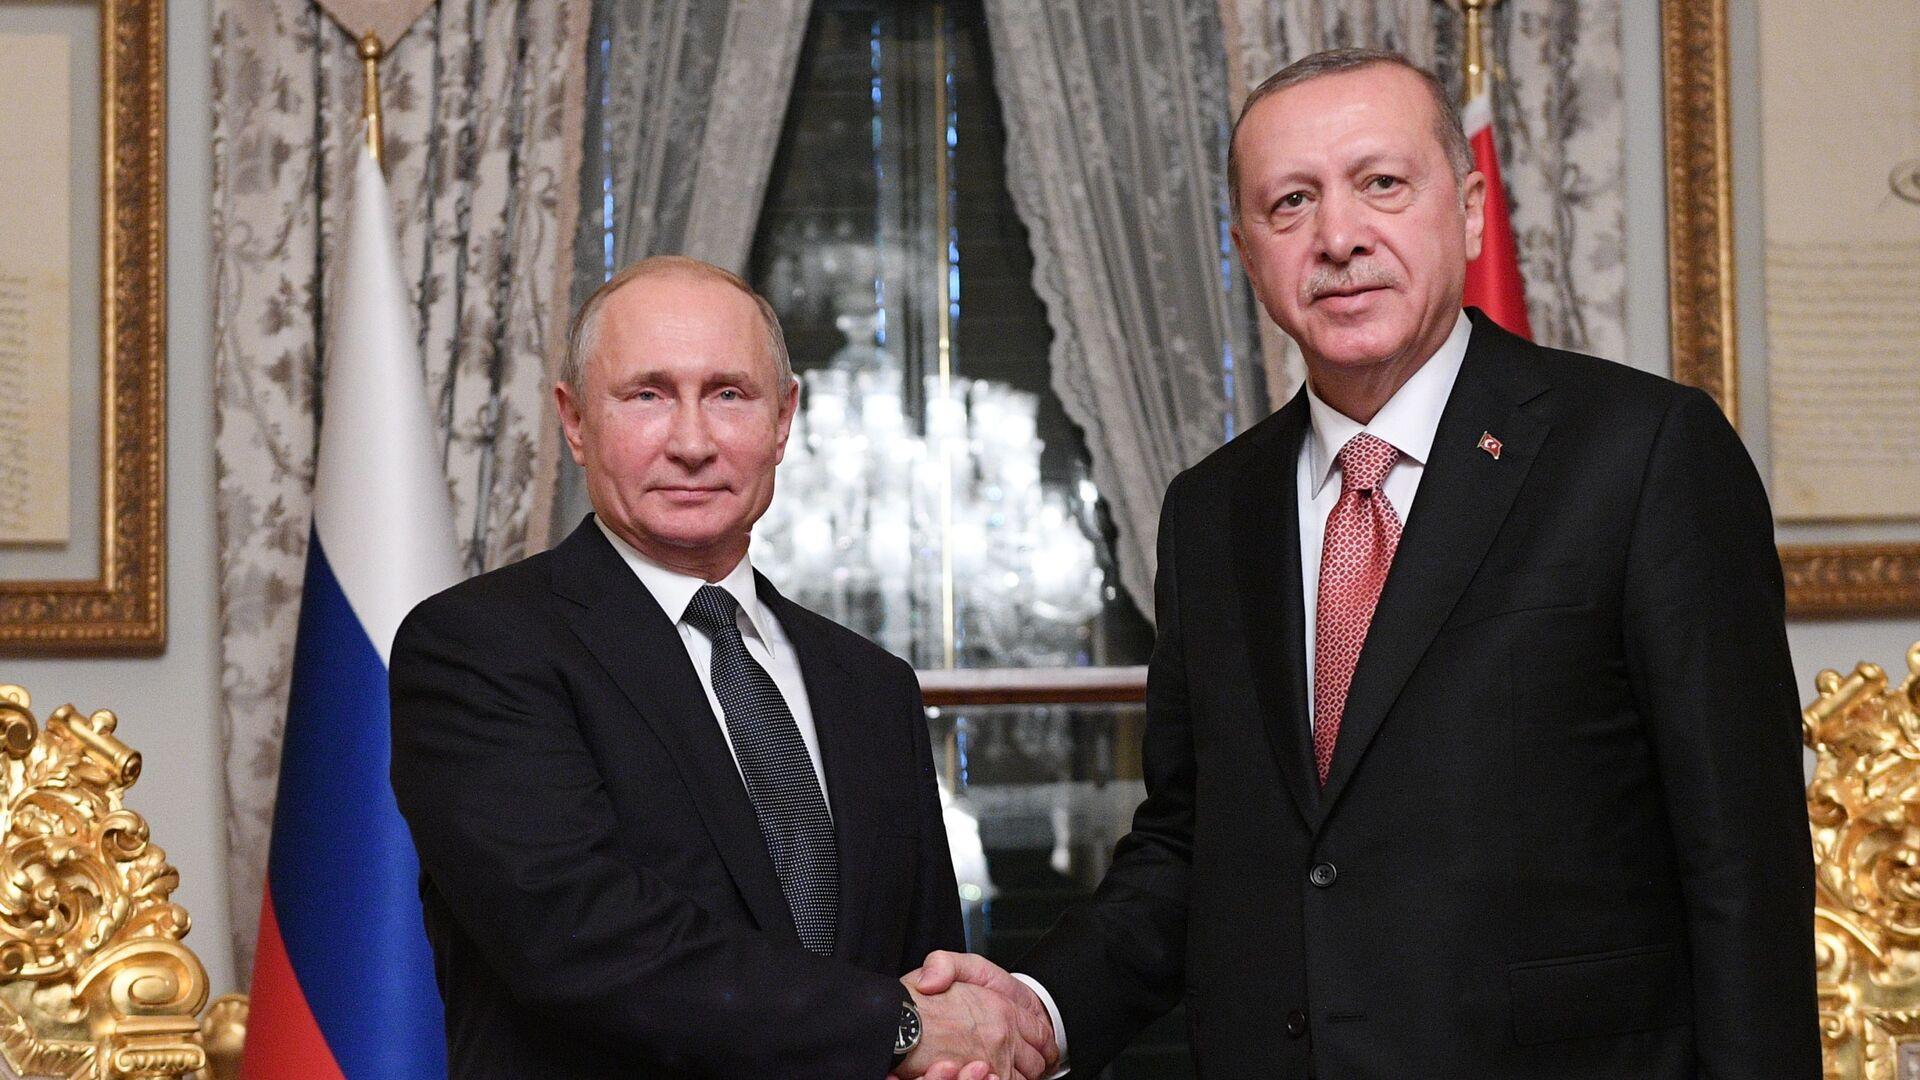 Prezident Ruska Vladimir Putin a prezident Turecka Tayyip Erdogan - Sputnik Česká republika, 1920, 12.05.2021